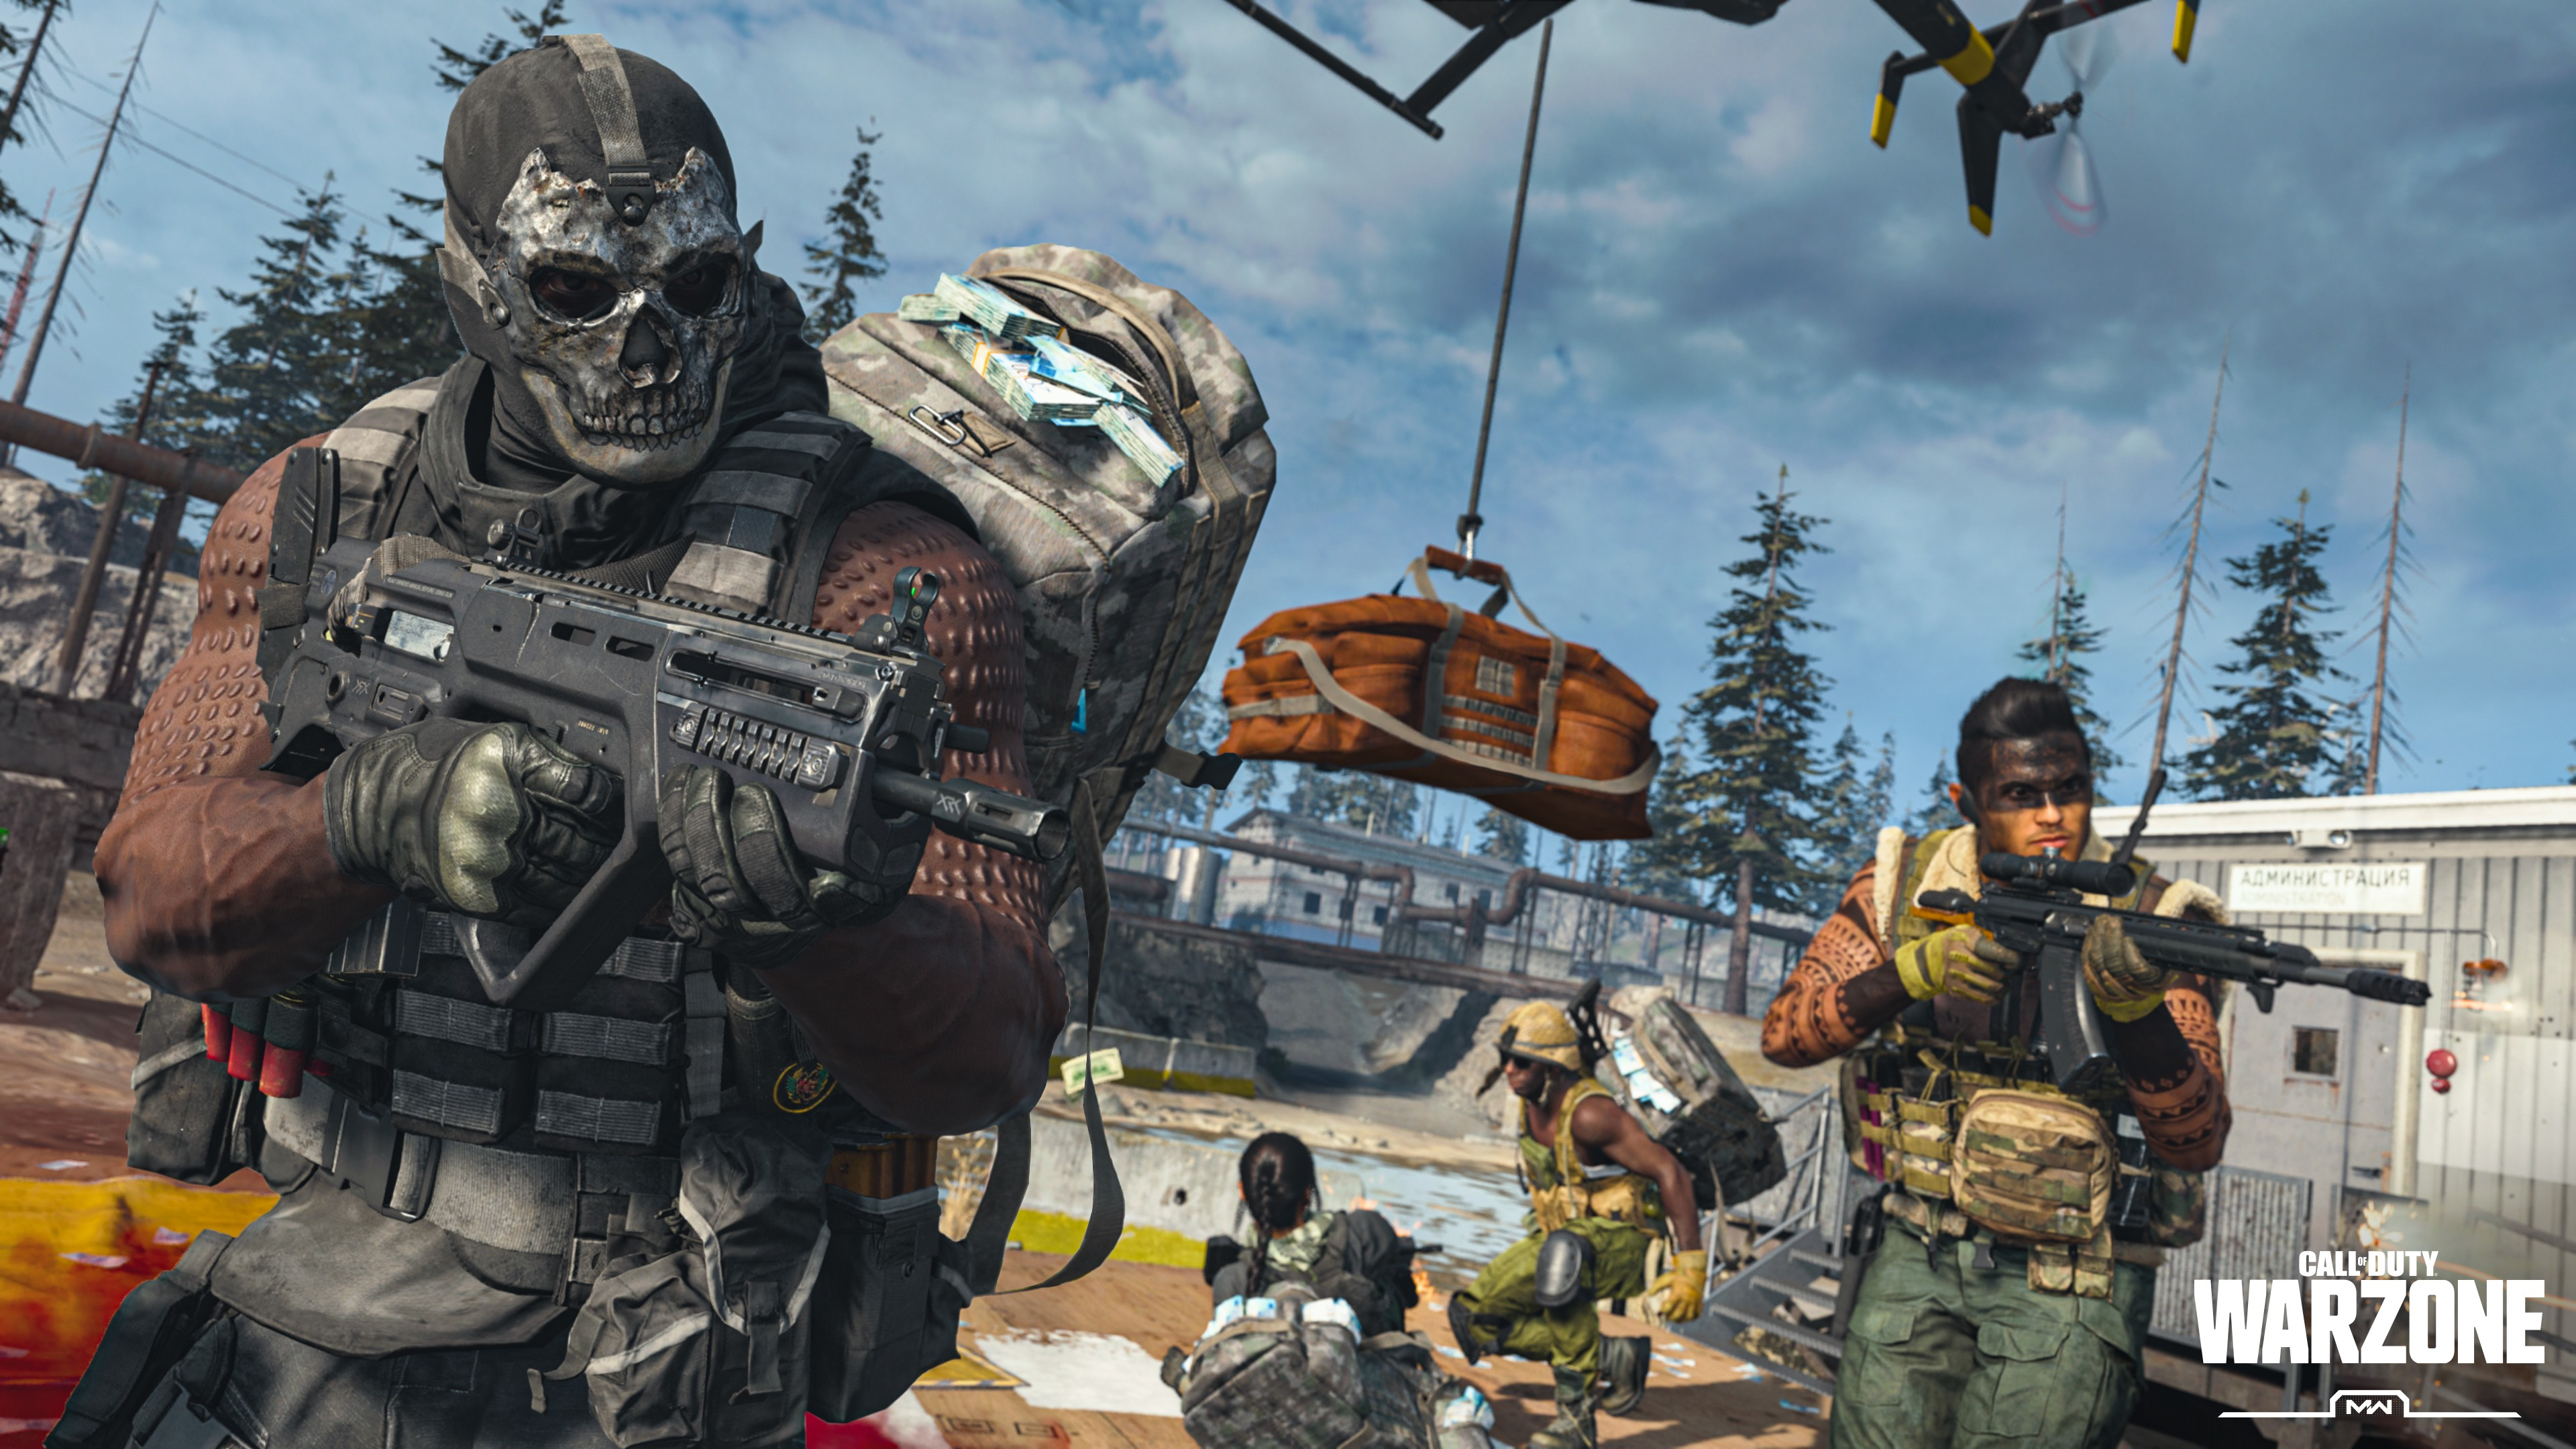 Call of Duty Warzone Squad Wallpaper 4k Ultra HD ID:5040